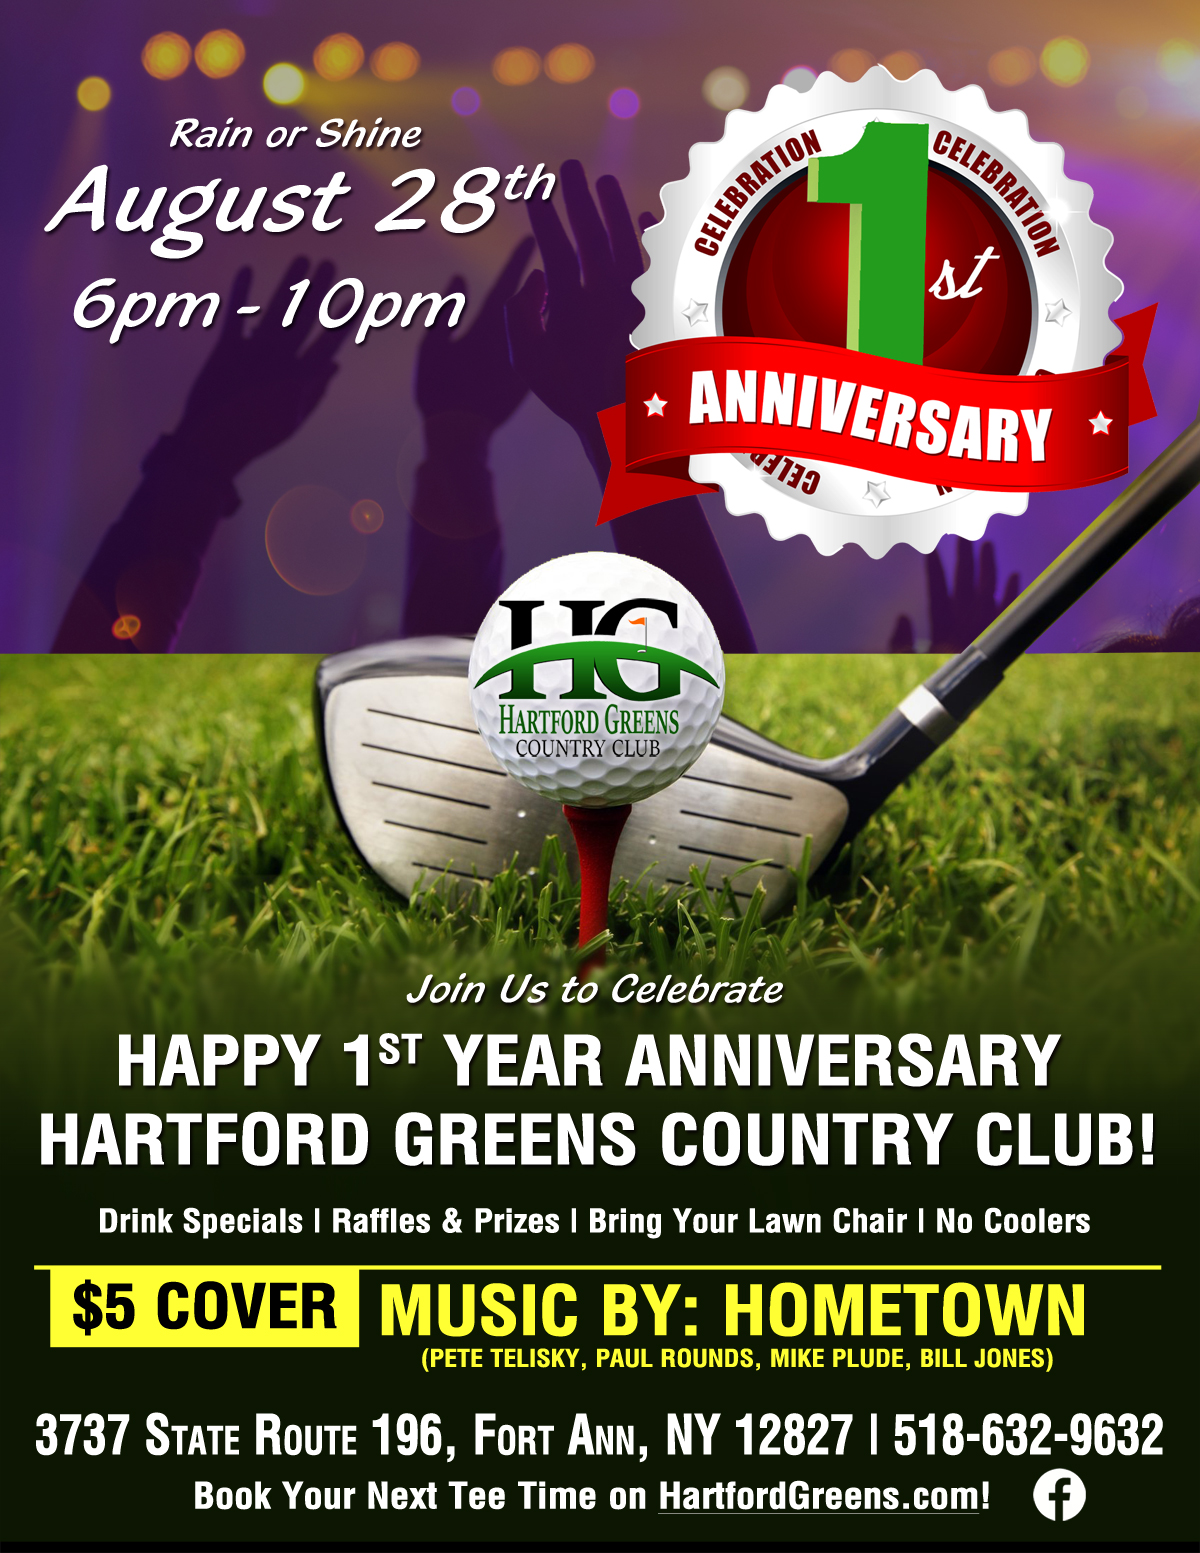 Hartford Greens Country Club's 1st Anniversary Celebration Event